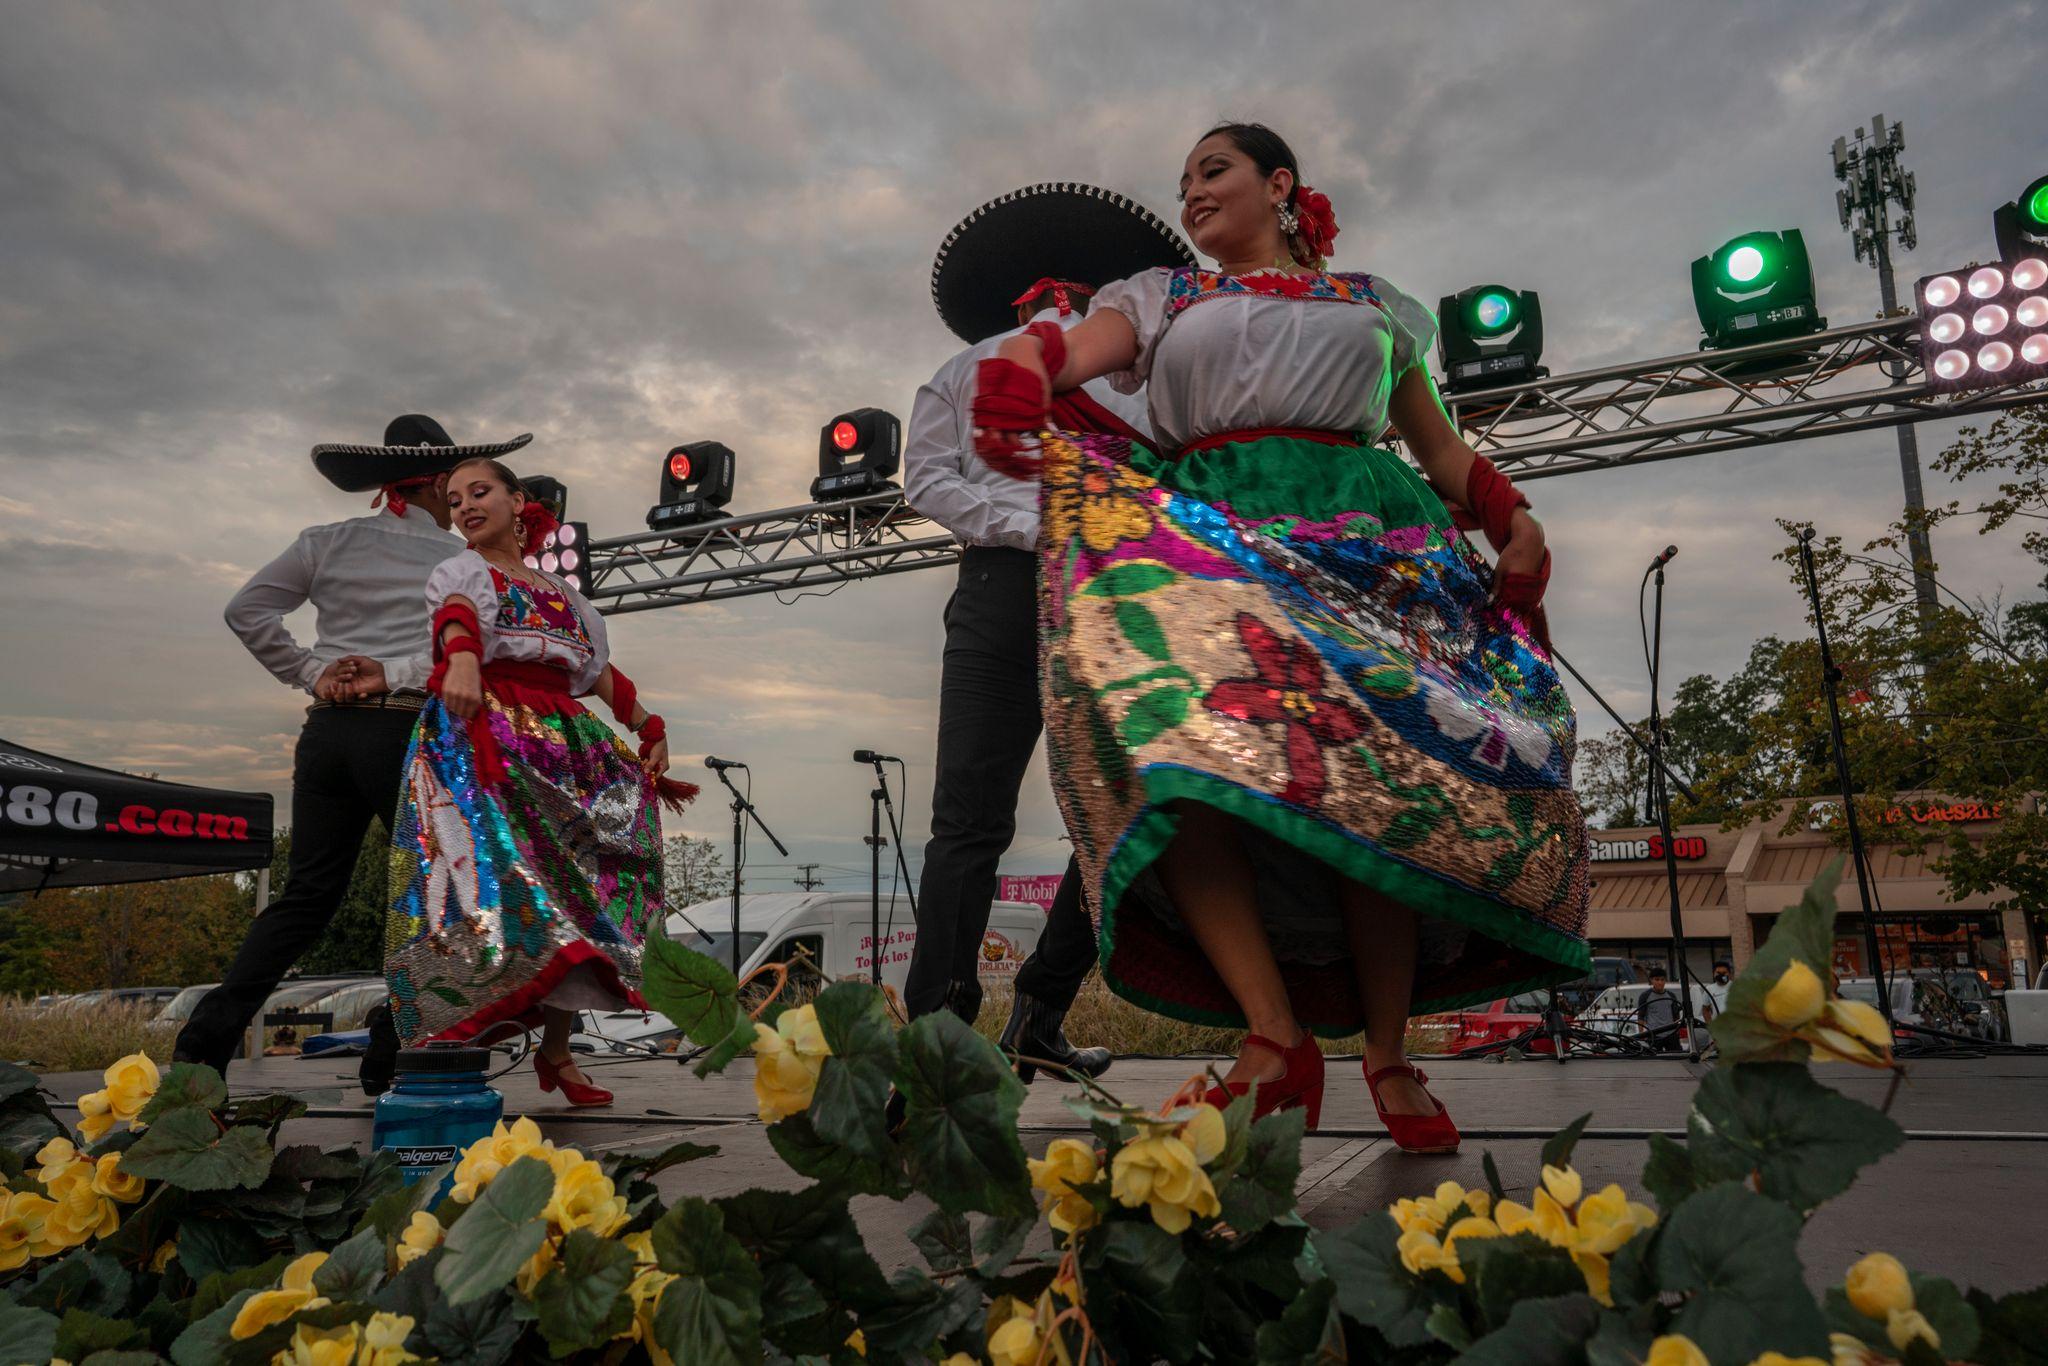 Ballet Folklorico Sol de Mexico dancers Ruby Rodriguez, Maricruz Vilchis, Jose Luis Escoto and Alan Solis perform traditional dancing during Mexican Independence Day at Plaza Mariachi. (Photo: John Partipilo)